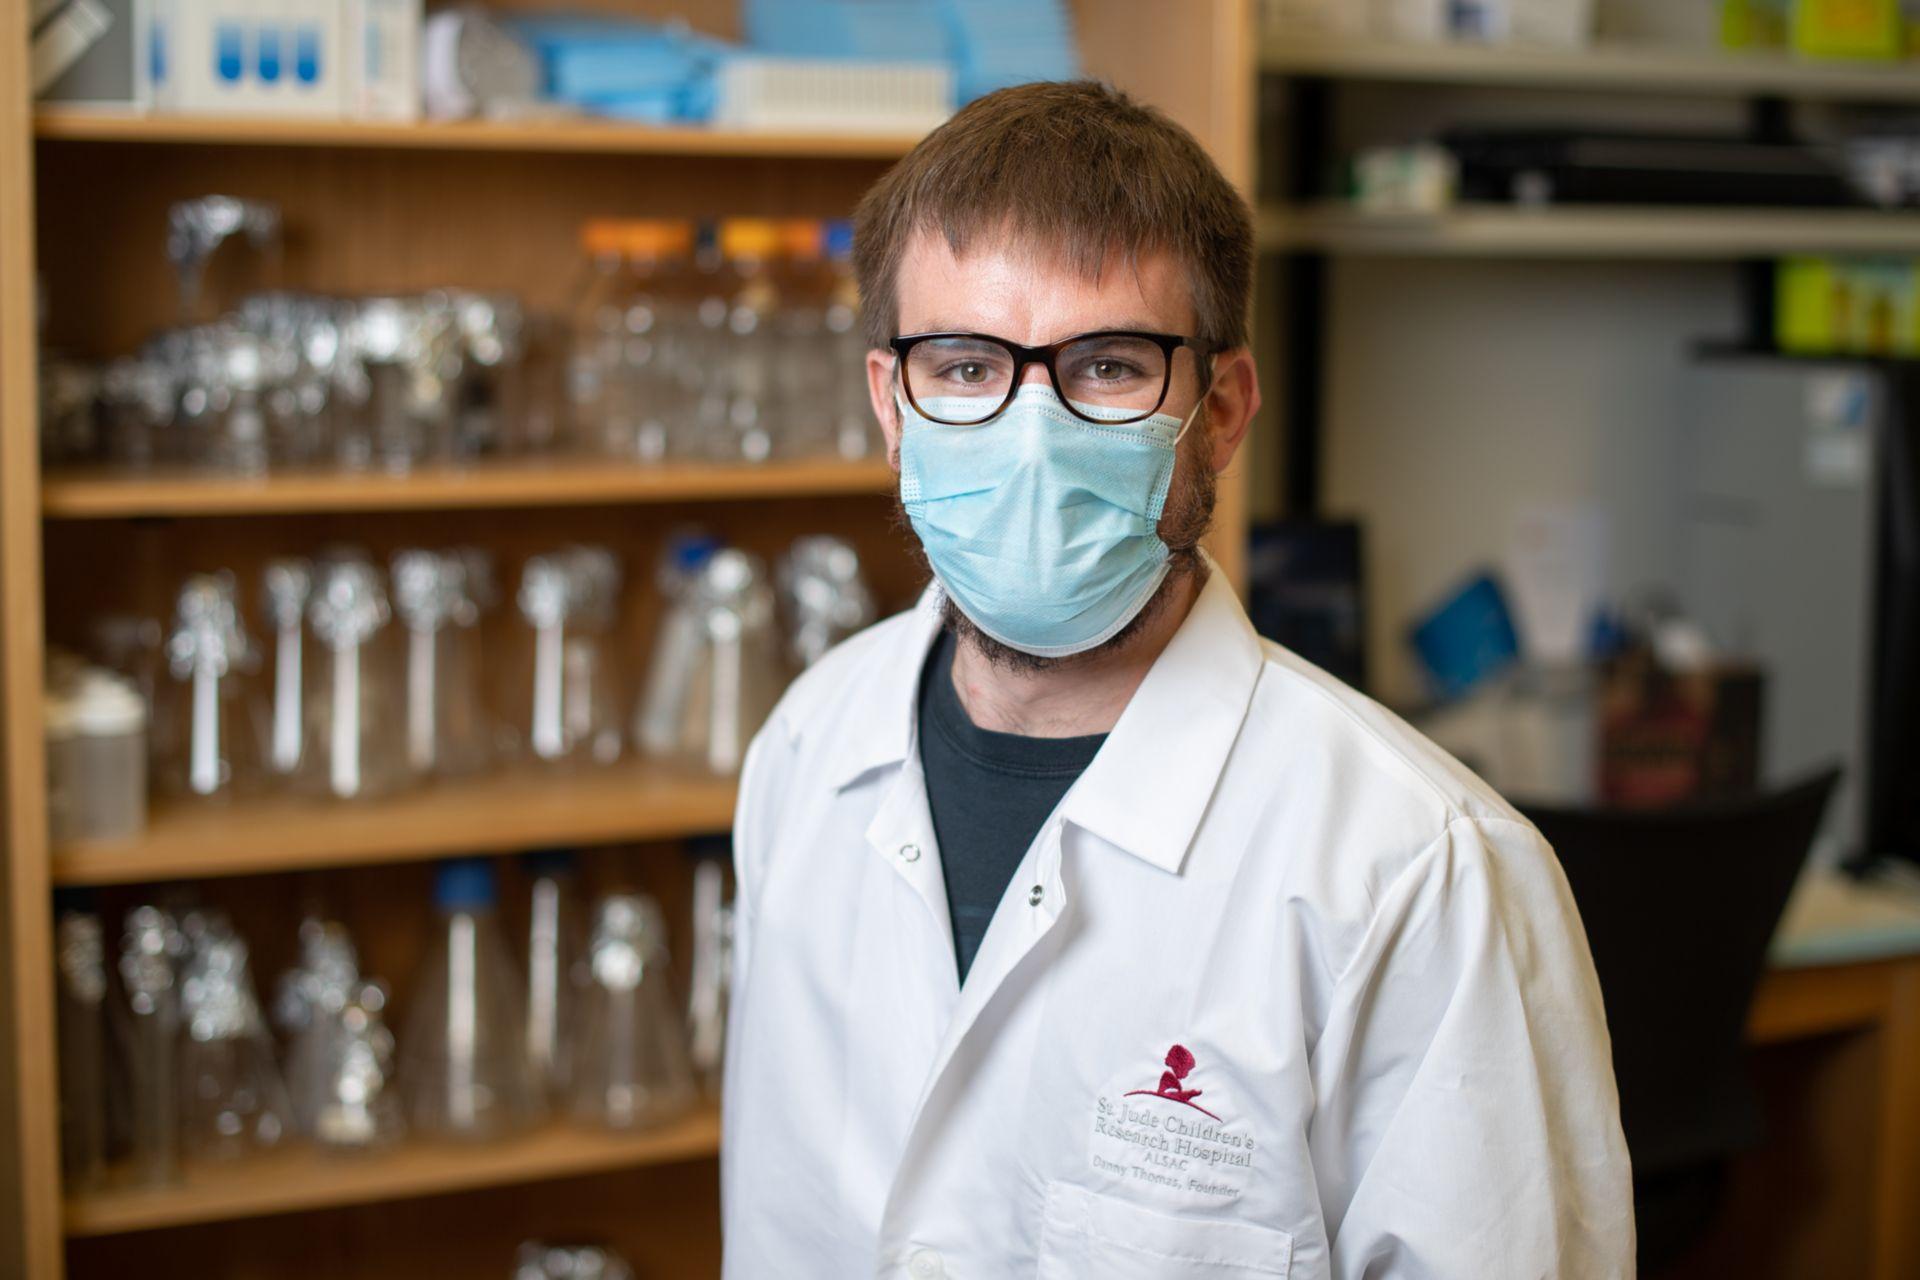 Jackson Mobley, PhD